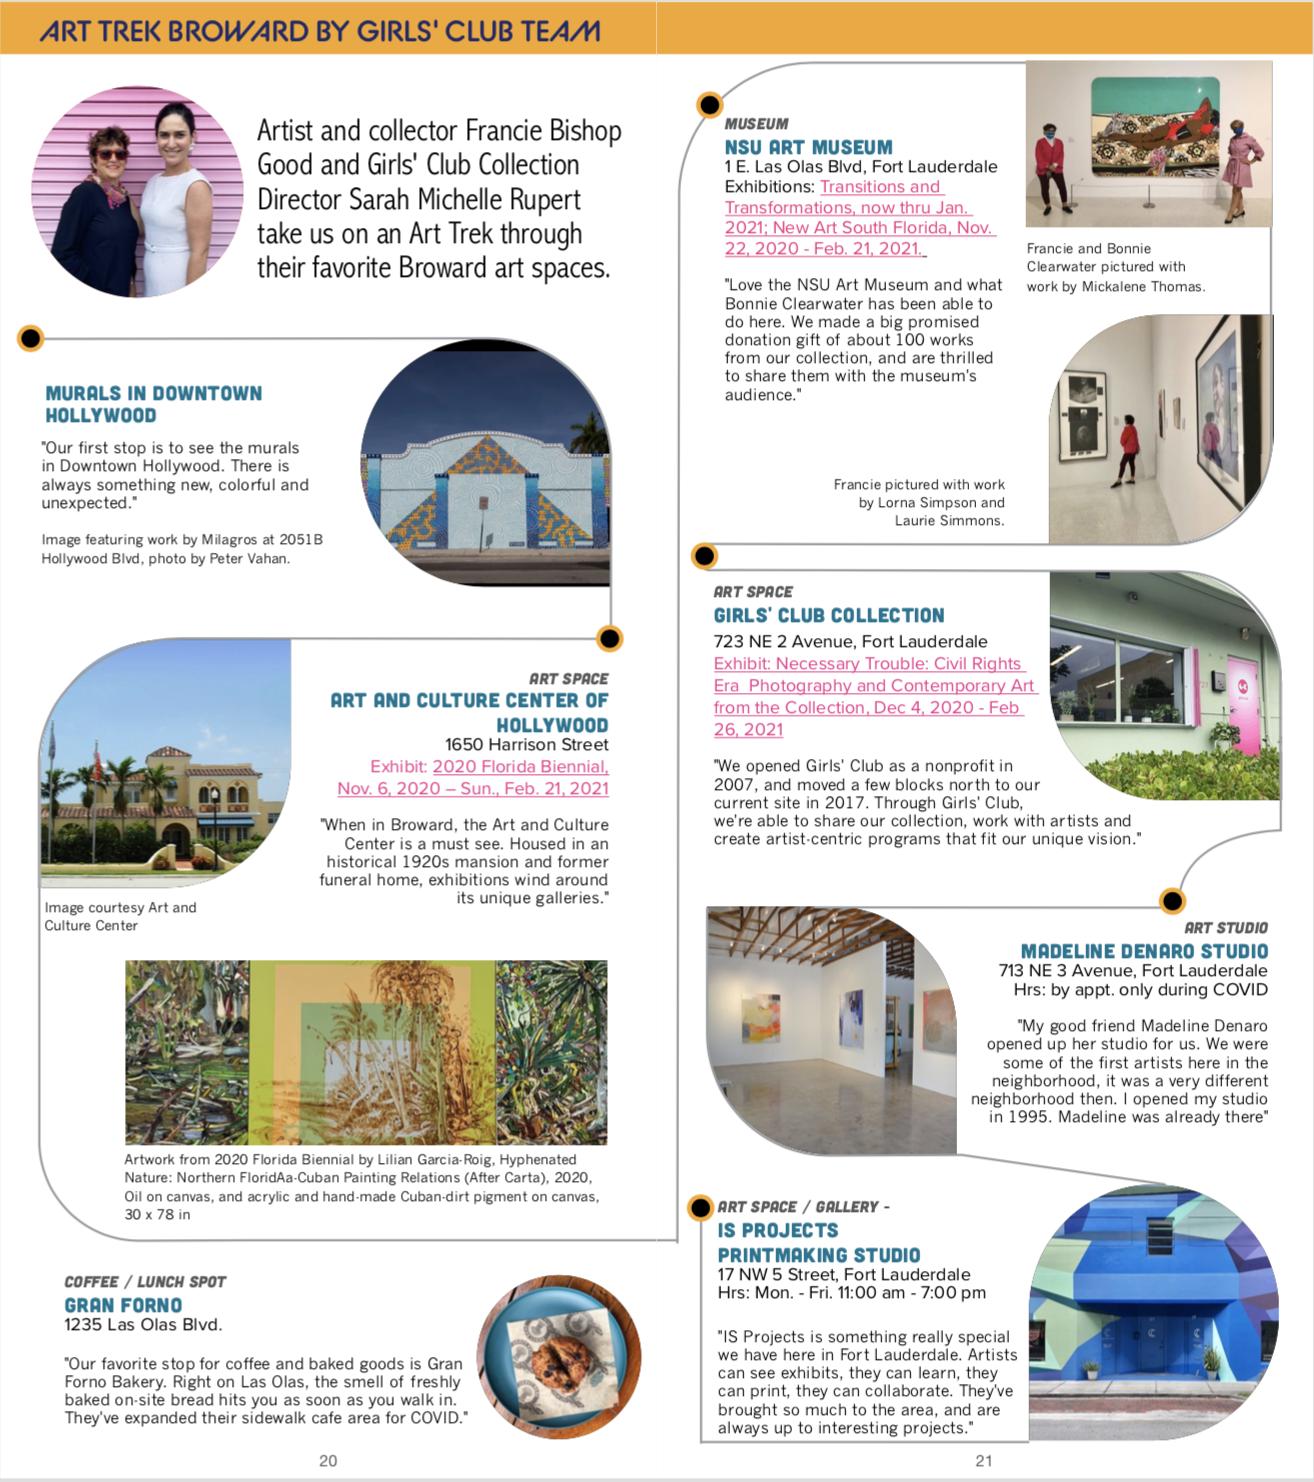 Art Circuits page20-21, 2020 Digital Art Guide